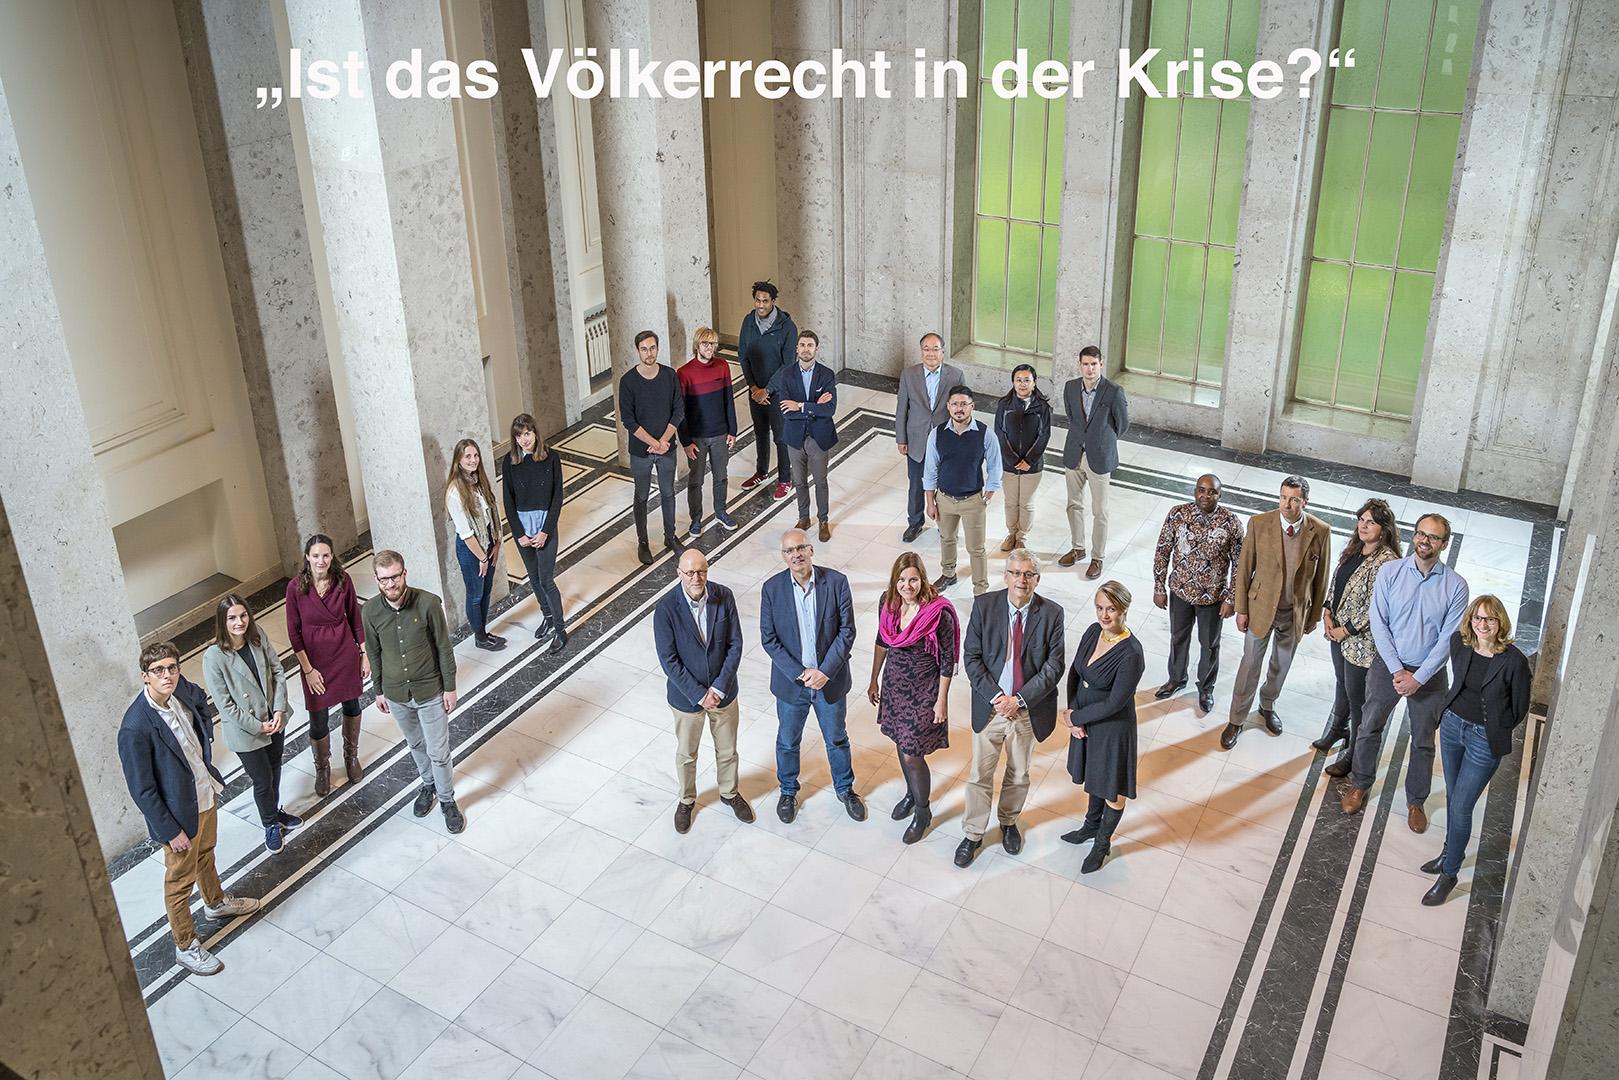 Universität Potsdam (UP), Humboldt-Universität zu Berlin (HU), Freie Universität Berlin (FU), Wissenschaftszentrum Berlin für Sozialforschung (WZB)